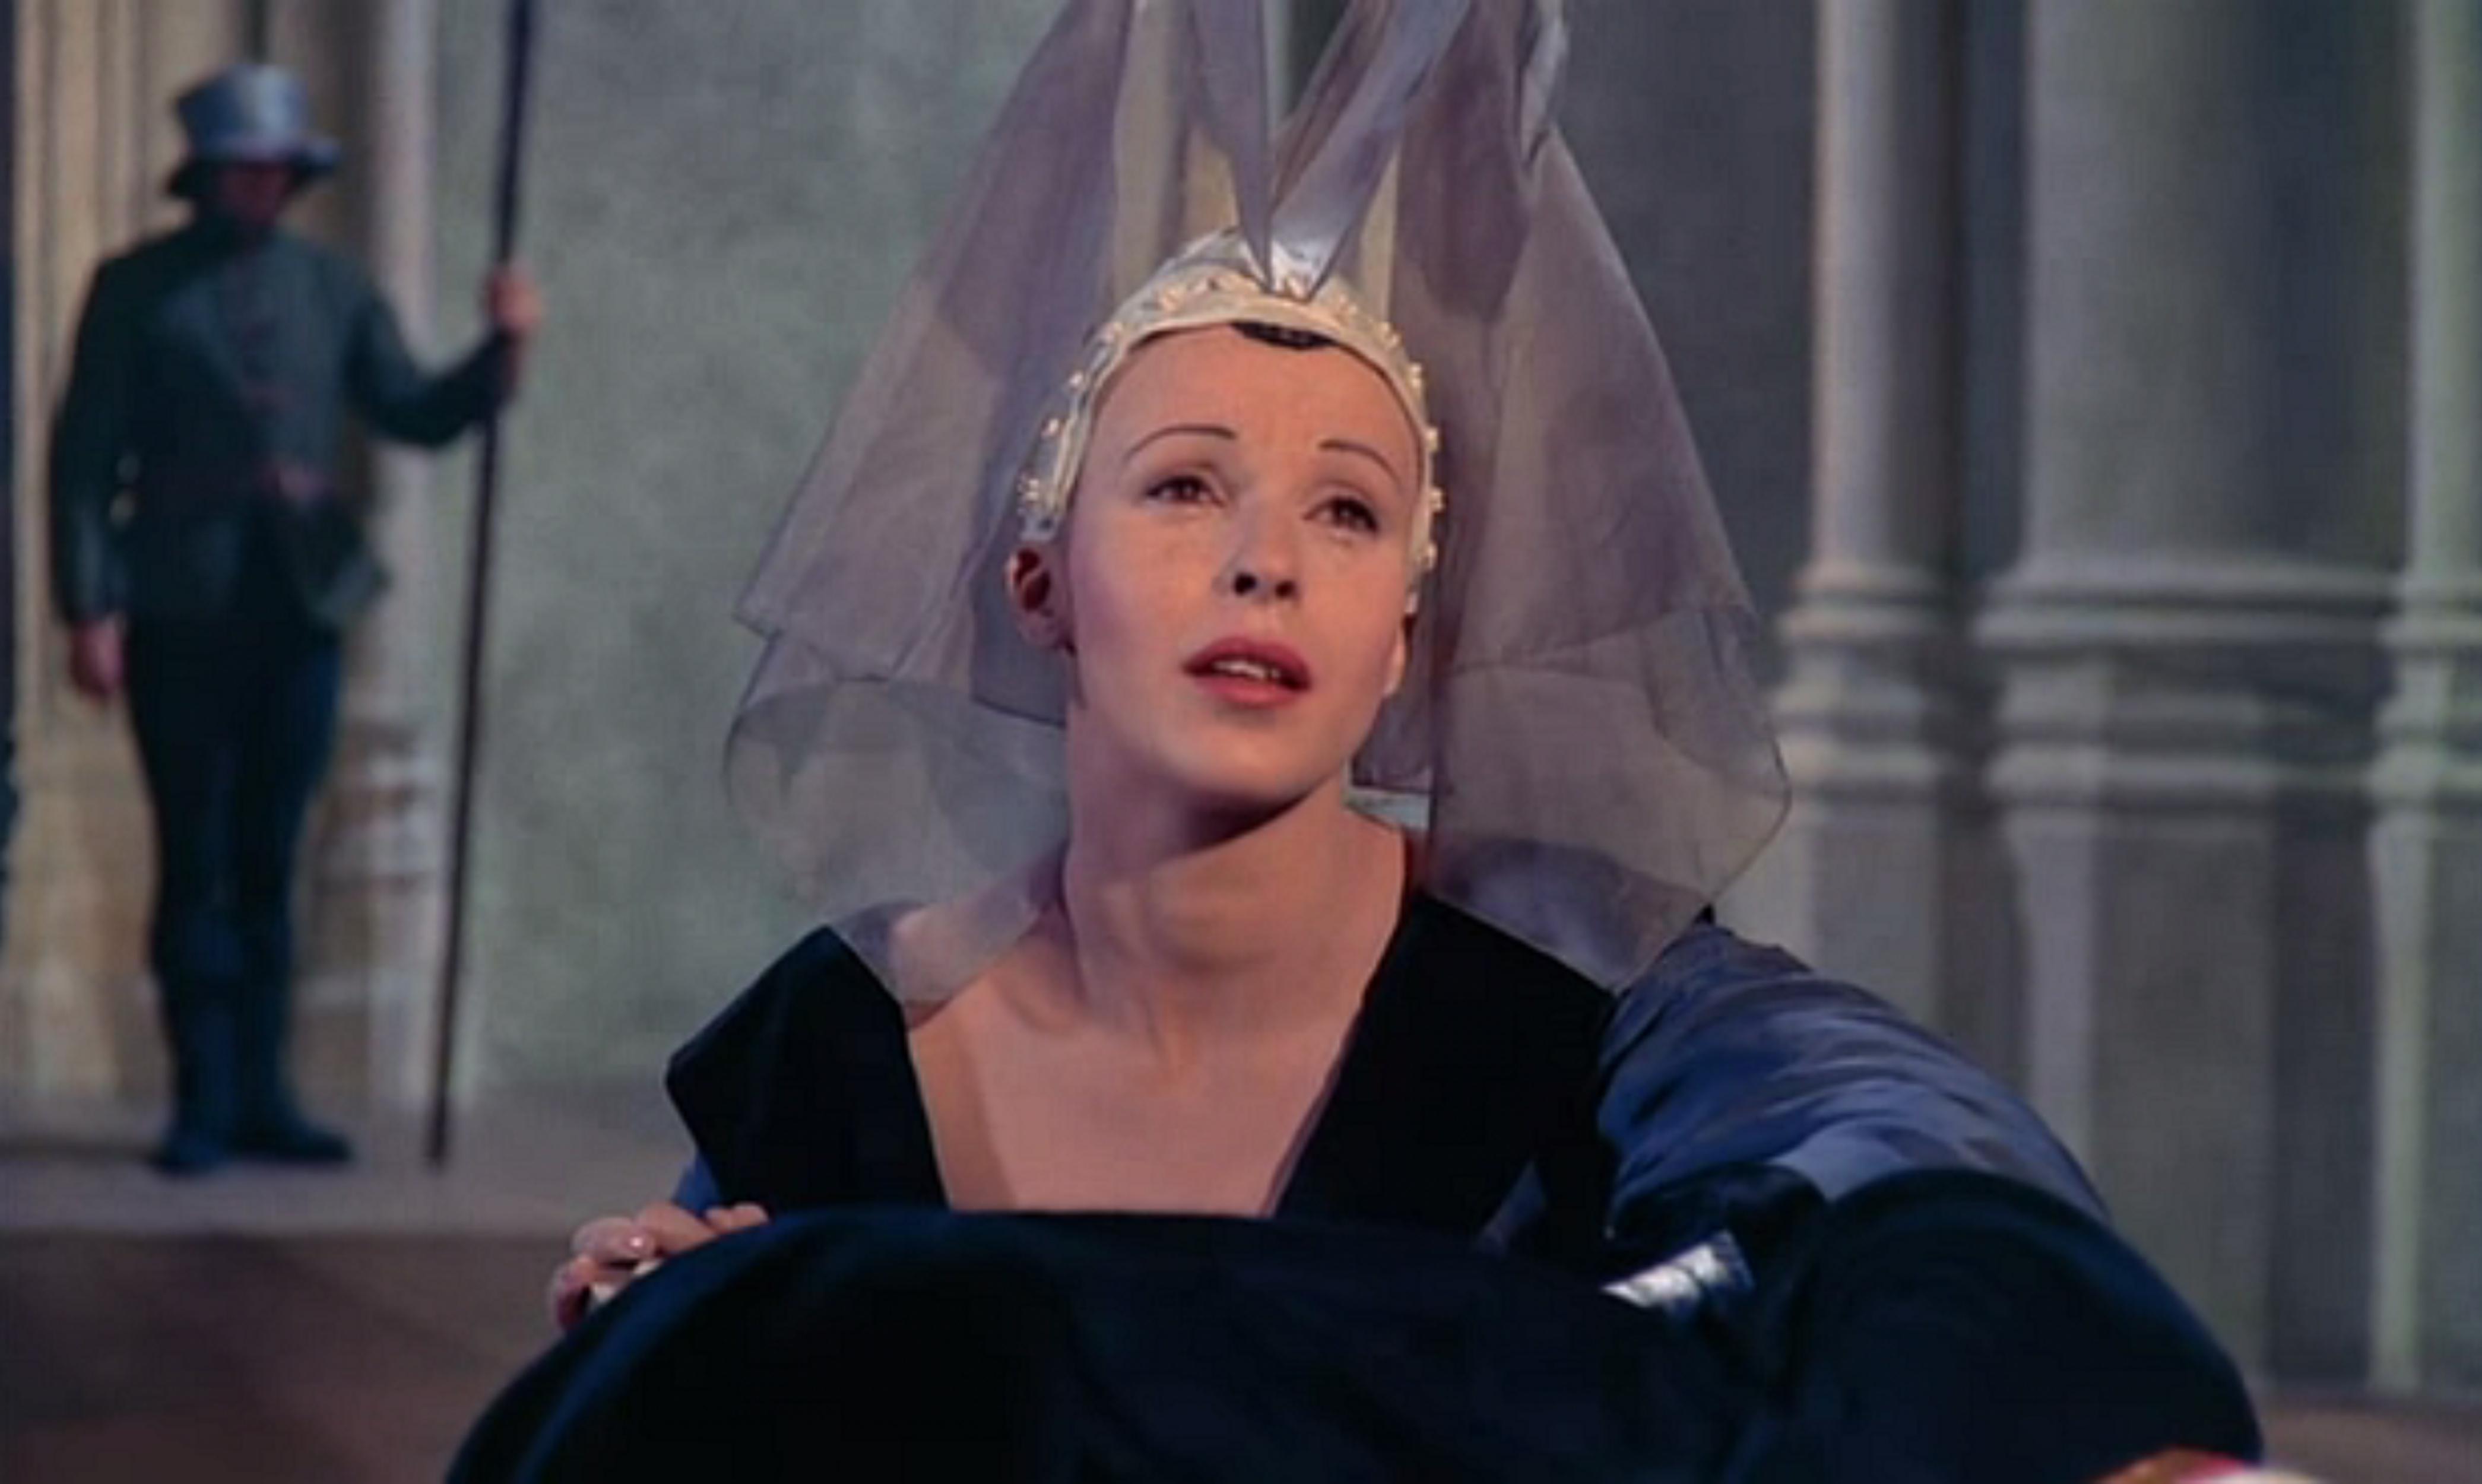 Claire Bloom in Richard III (1955)